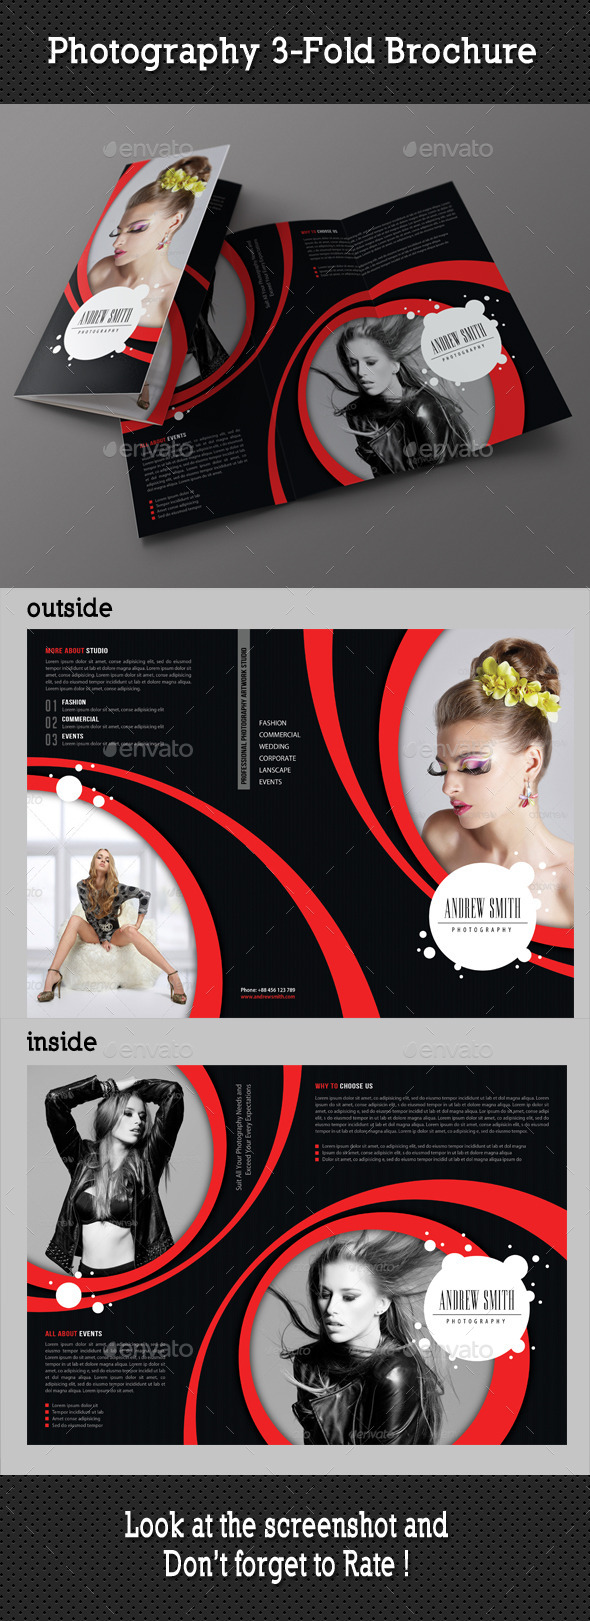 Photography Studio 3-Fold Brochure 03 - Portfolio Brochures